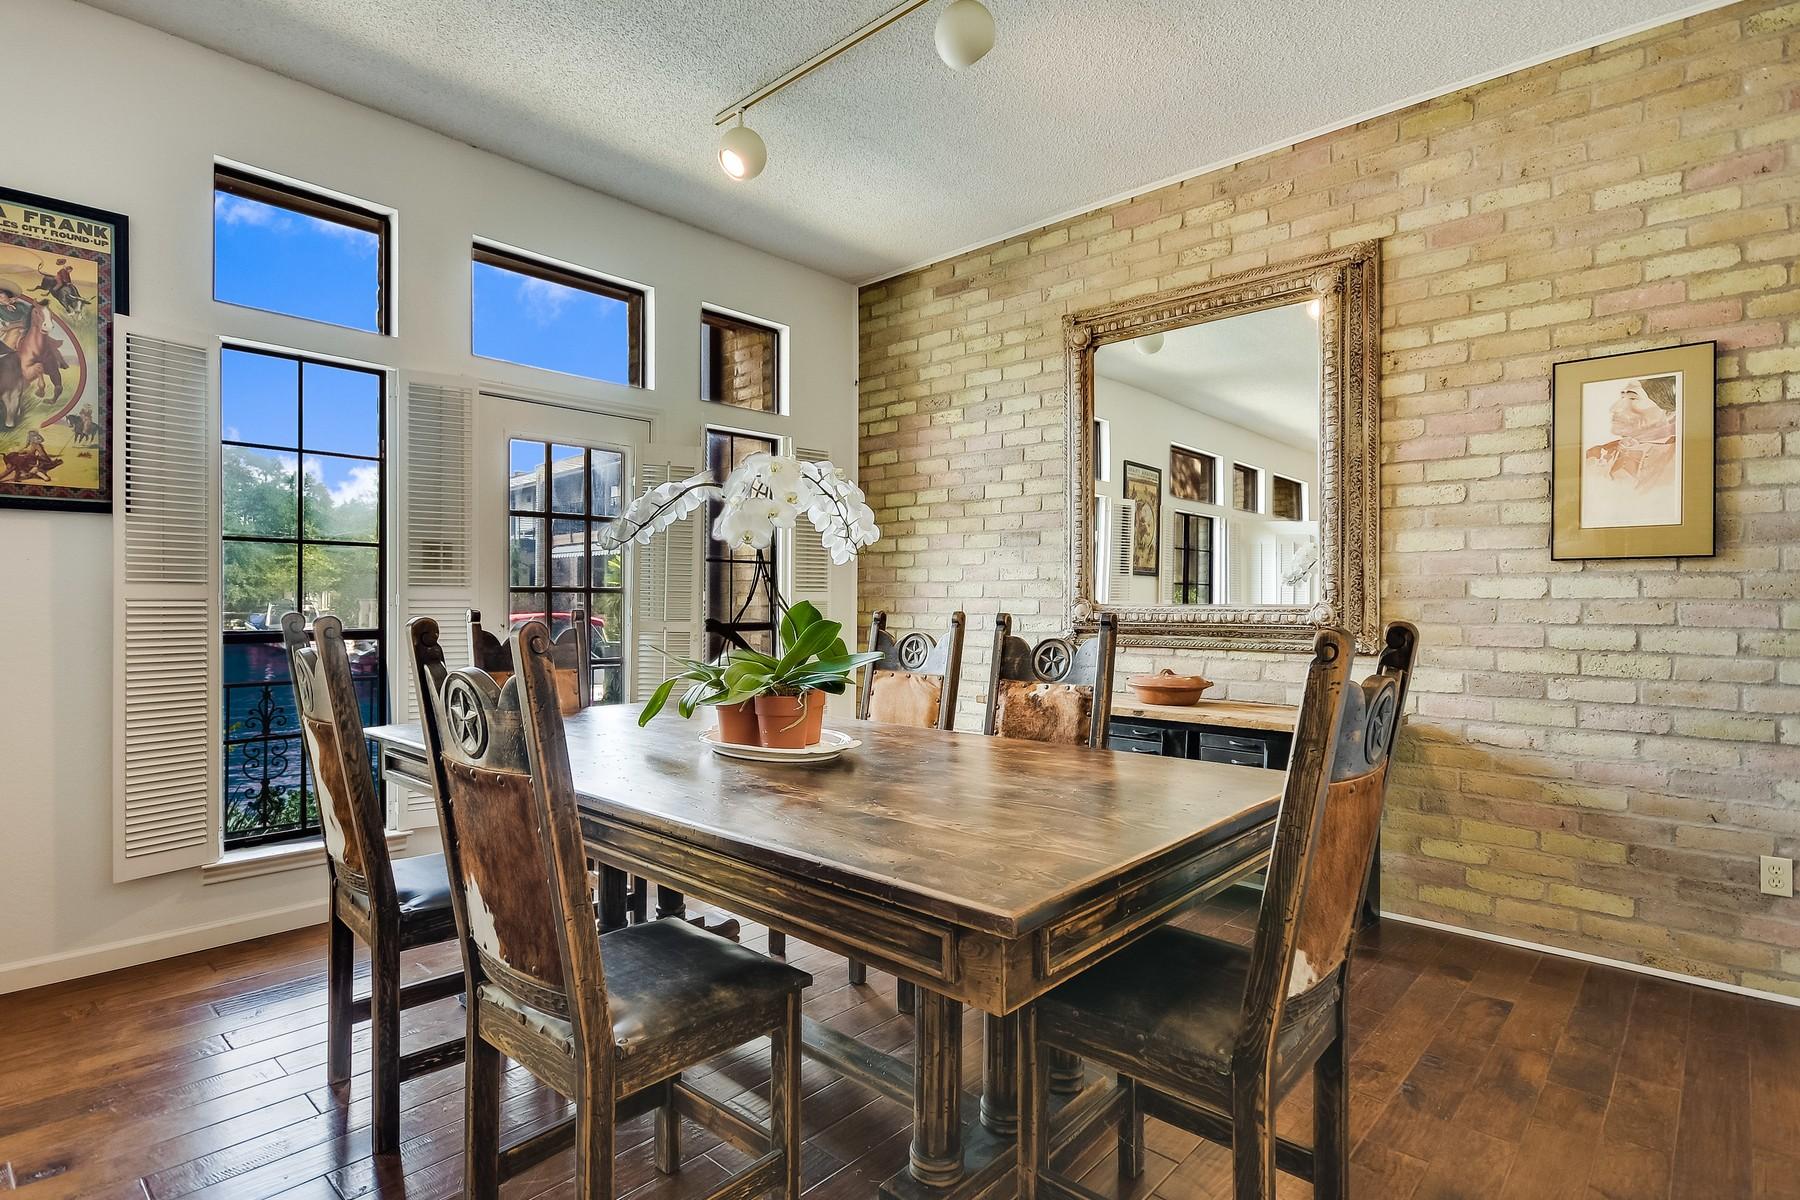 Additional photo for property listing at Orleans Harbor Condo on Lake Austin 2437 Westlake Dr Austin, Texas 78746 Estados Unidos